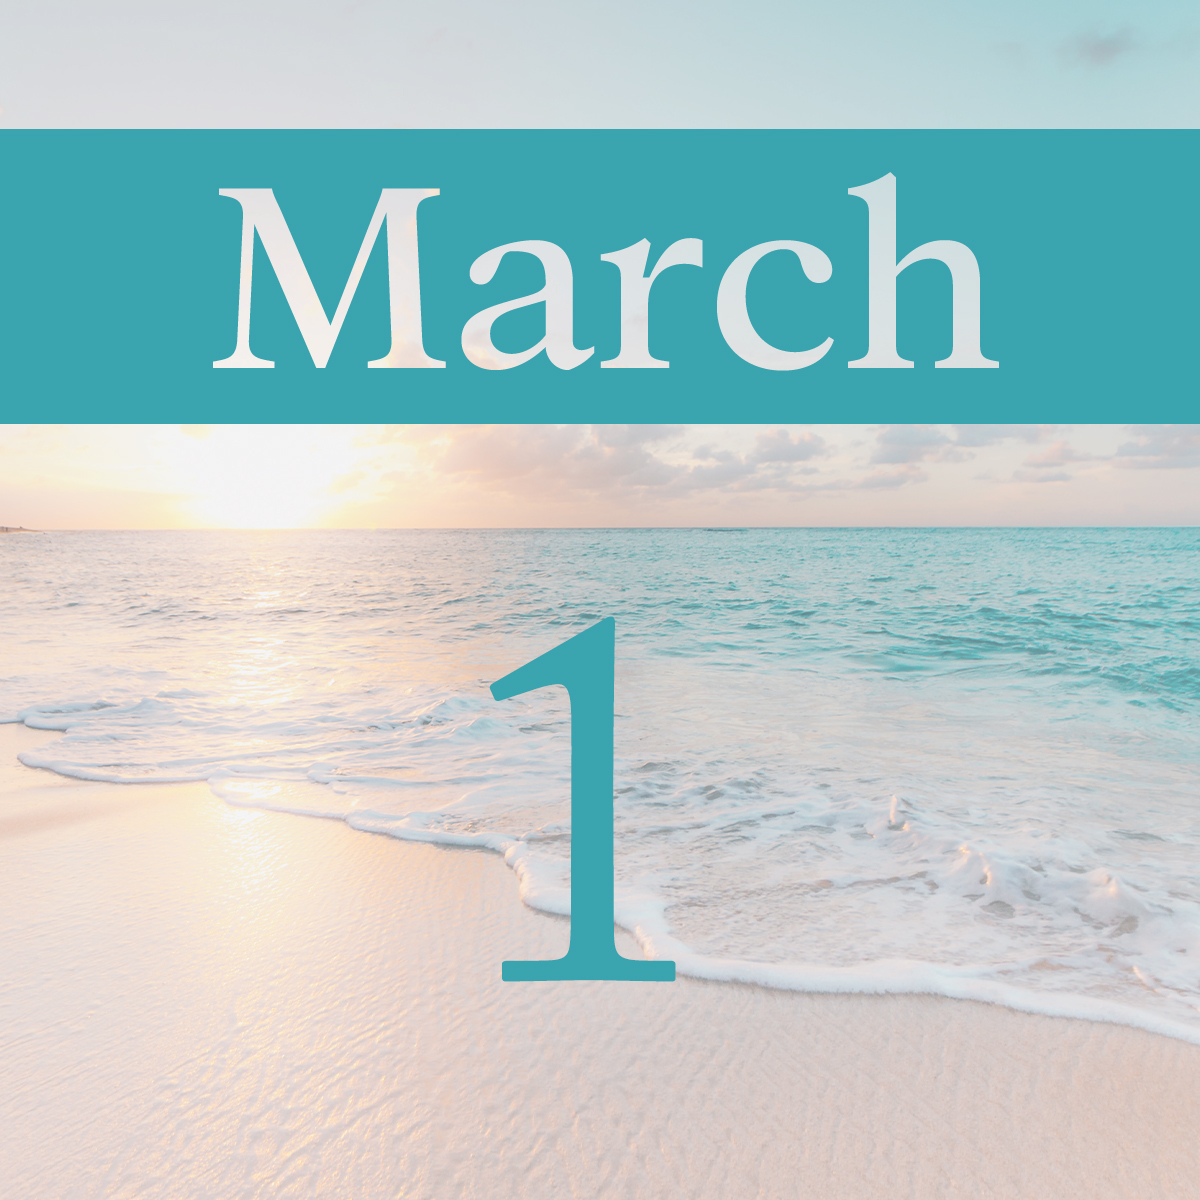 Sunday, March 1st